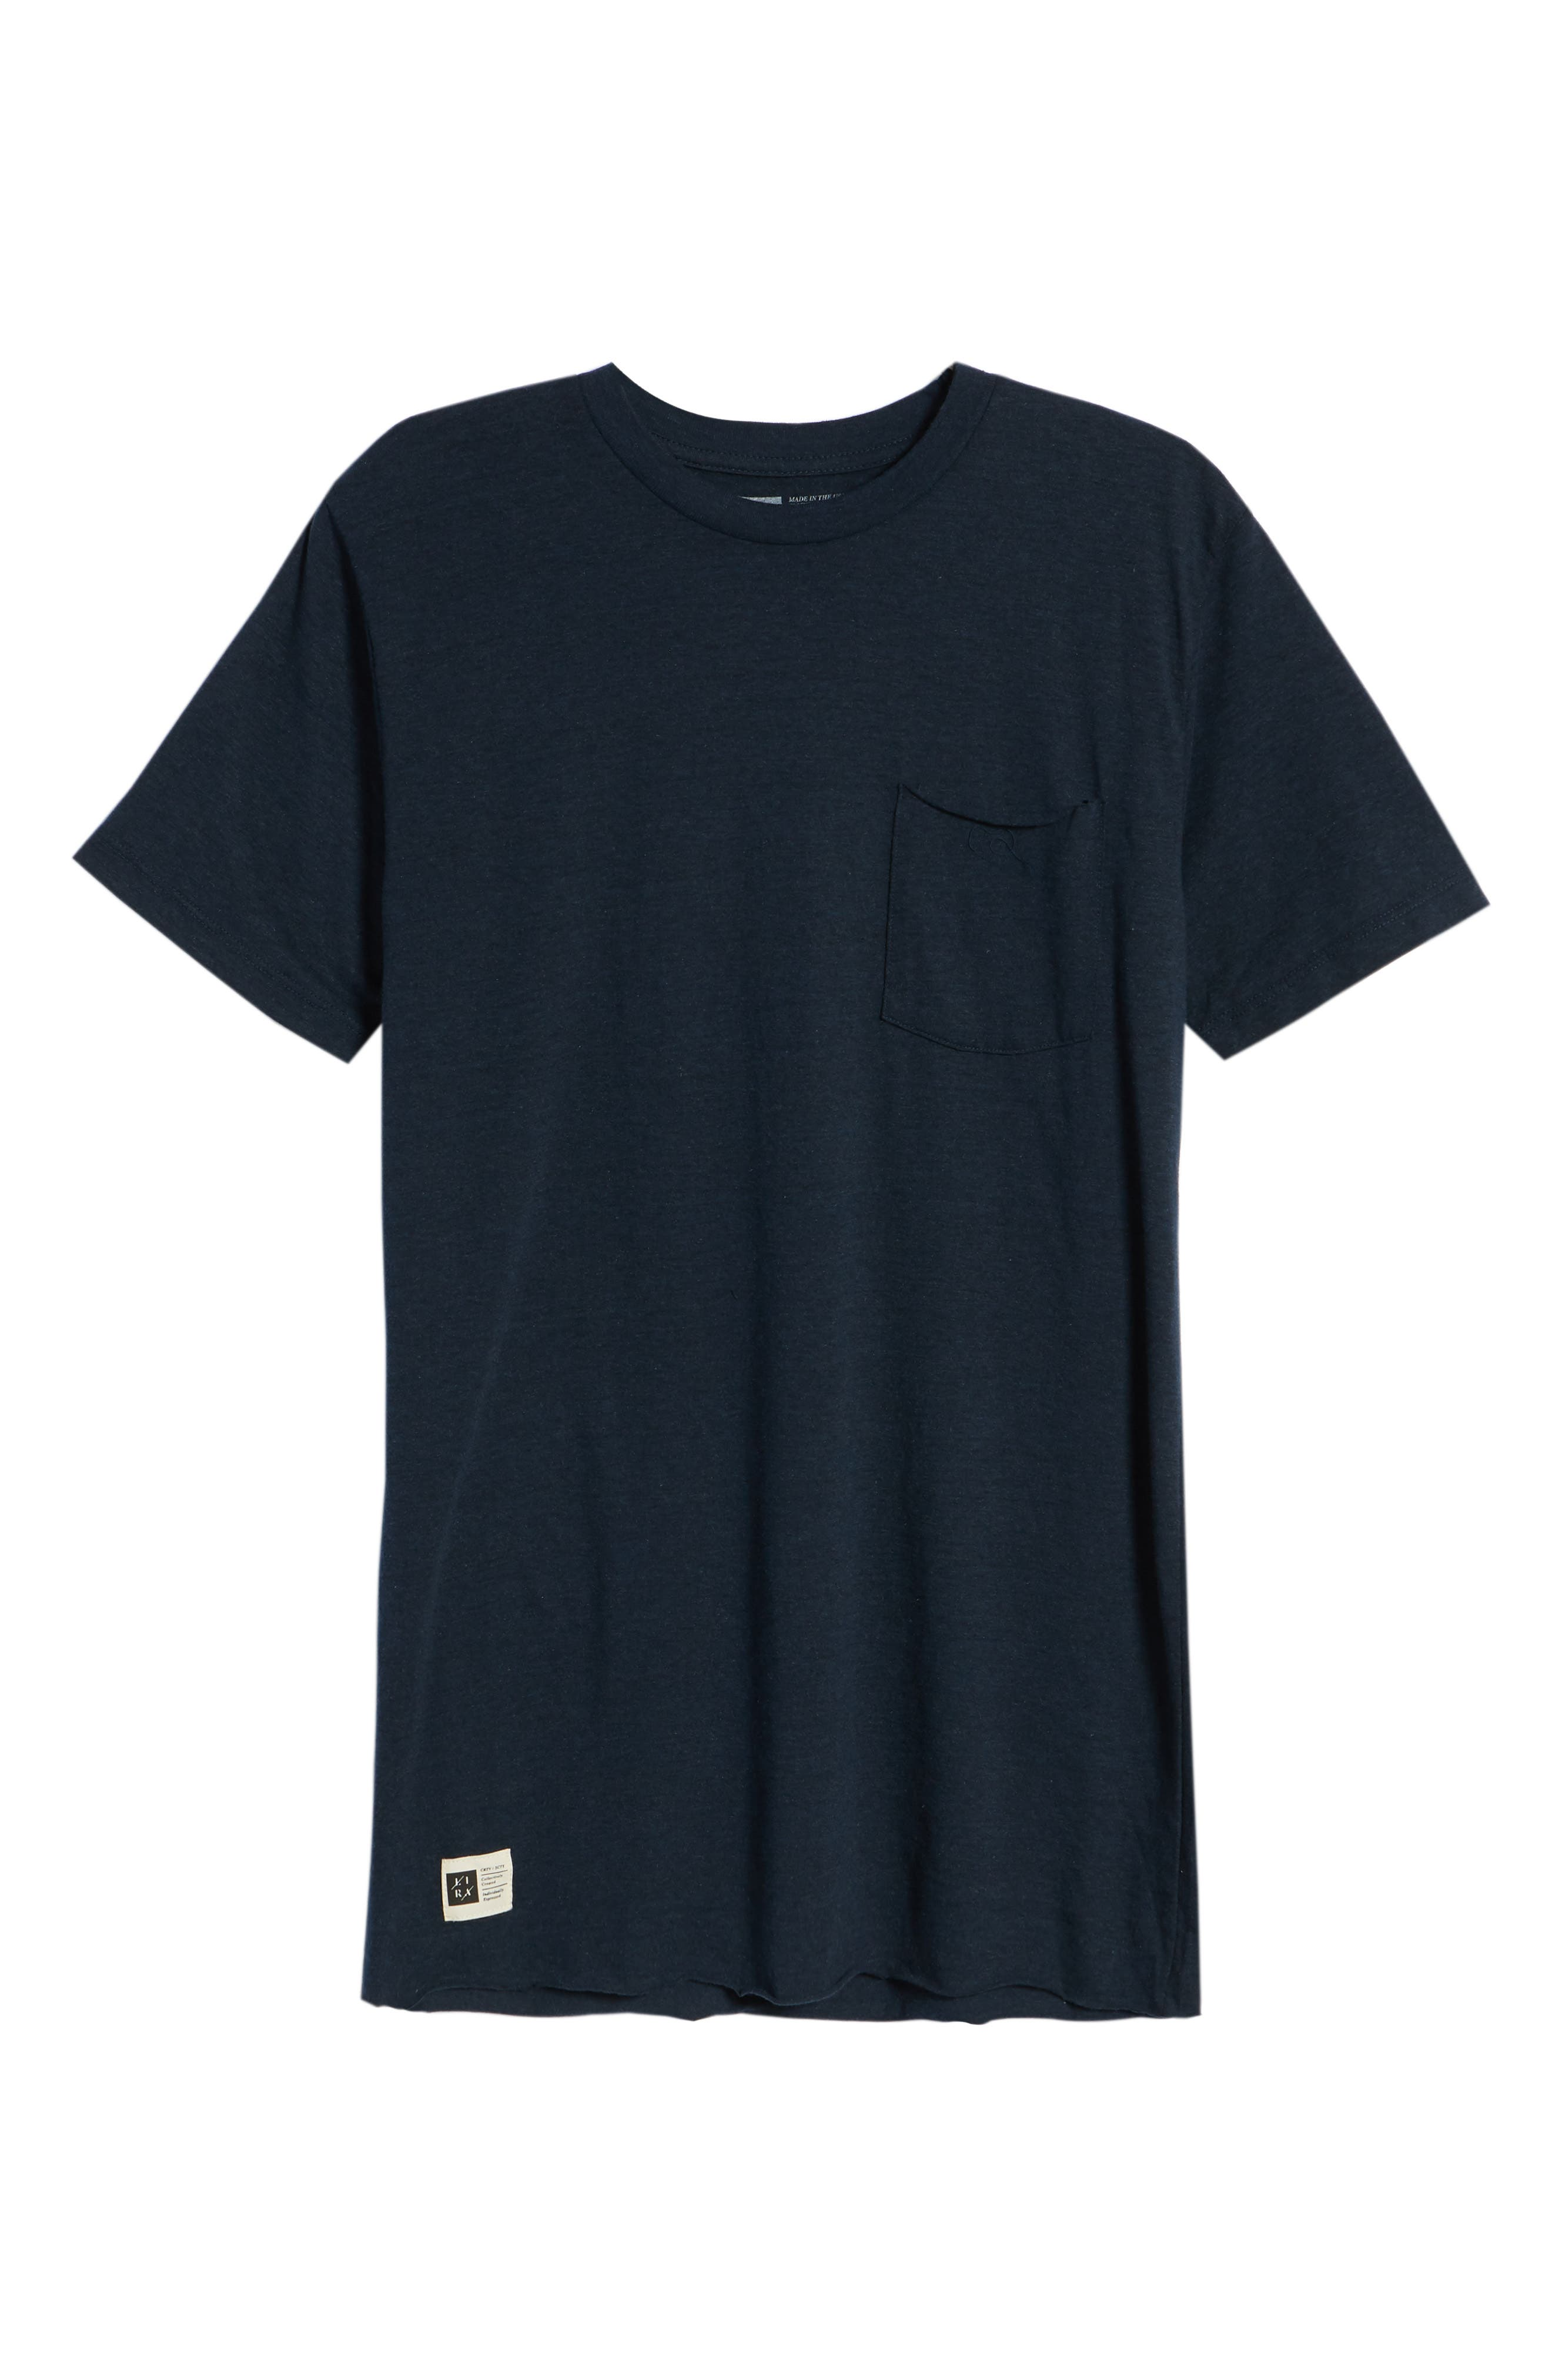 Winslow T-Shirt,                             Alternate thumbnail 6, color,                             Heather Navy